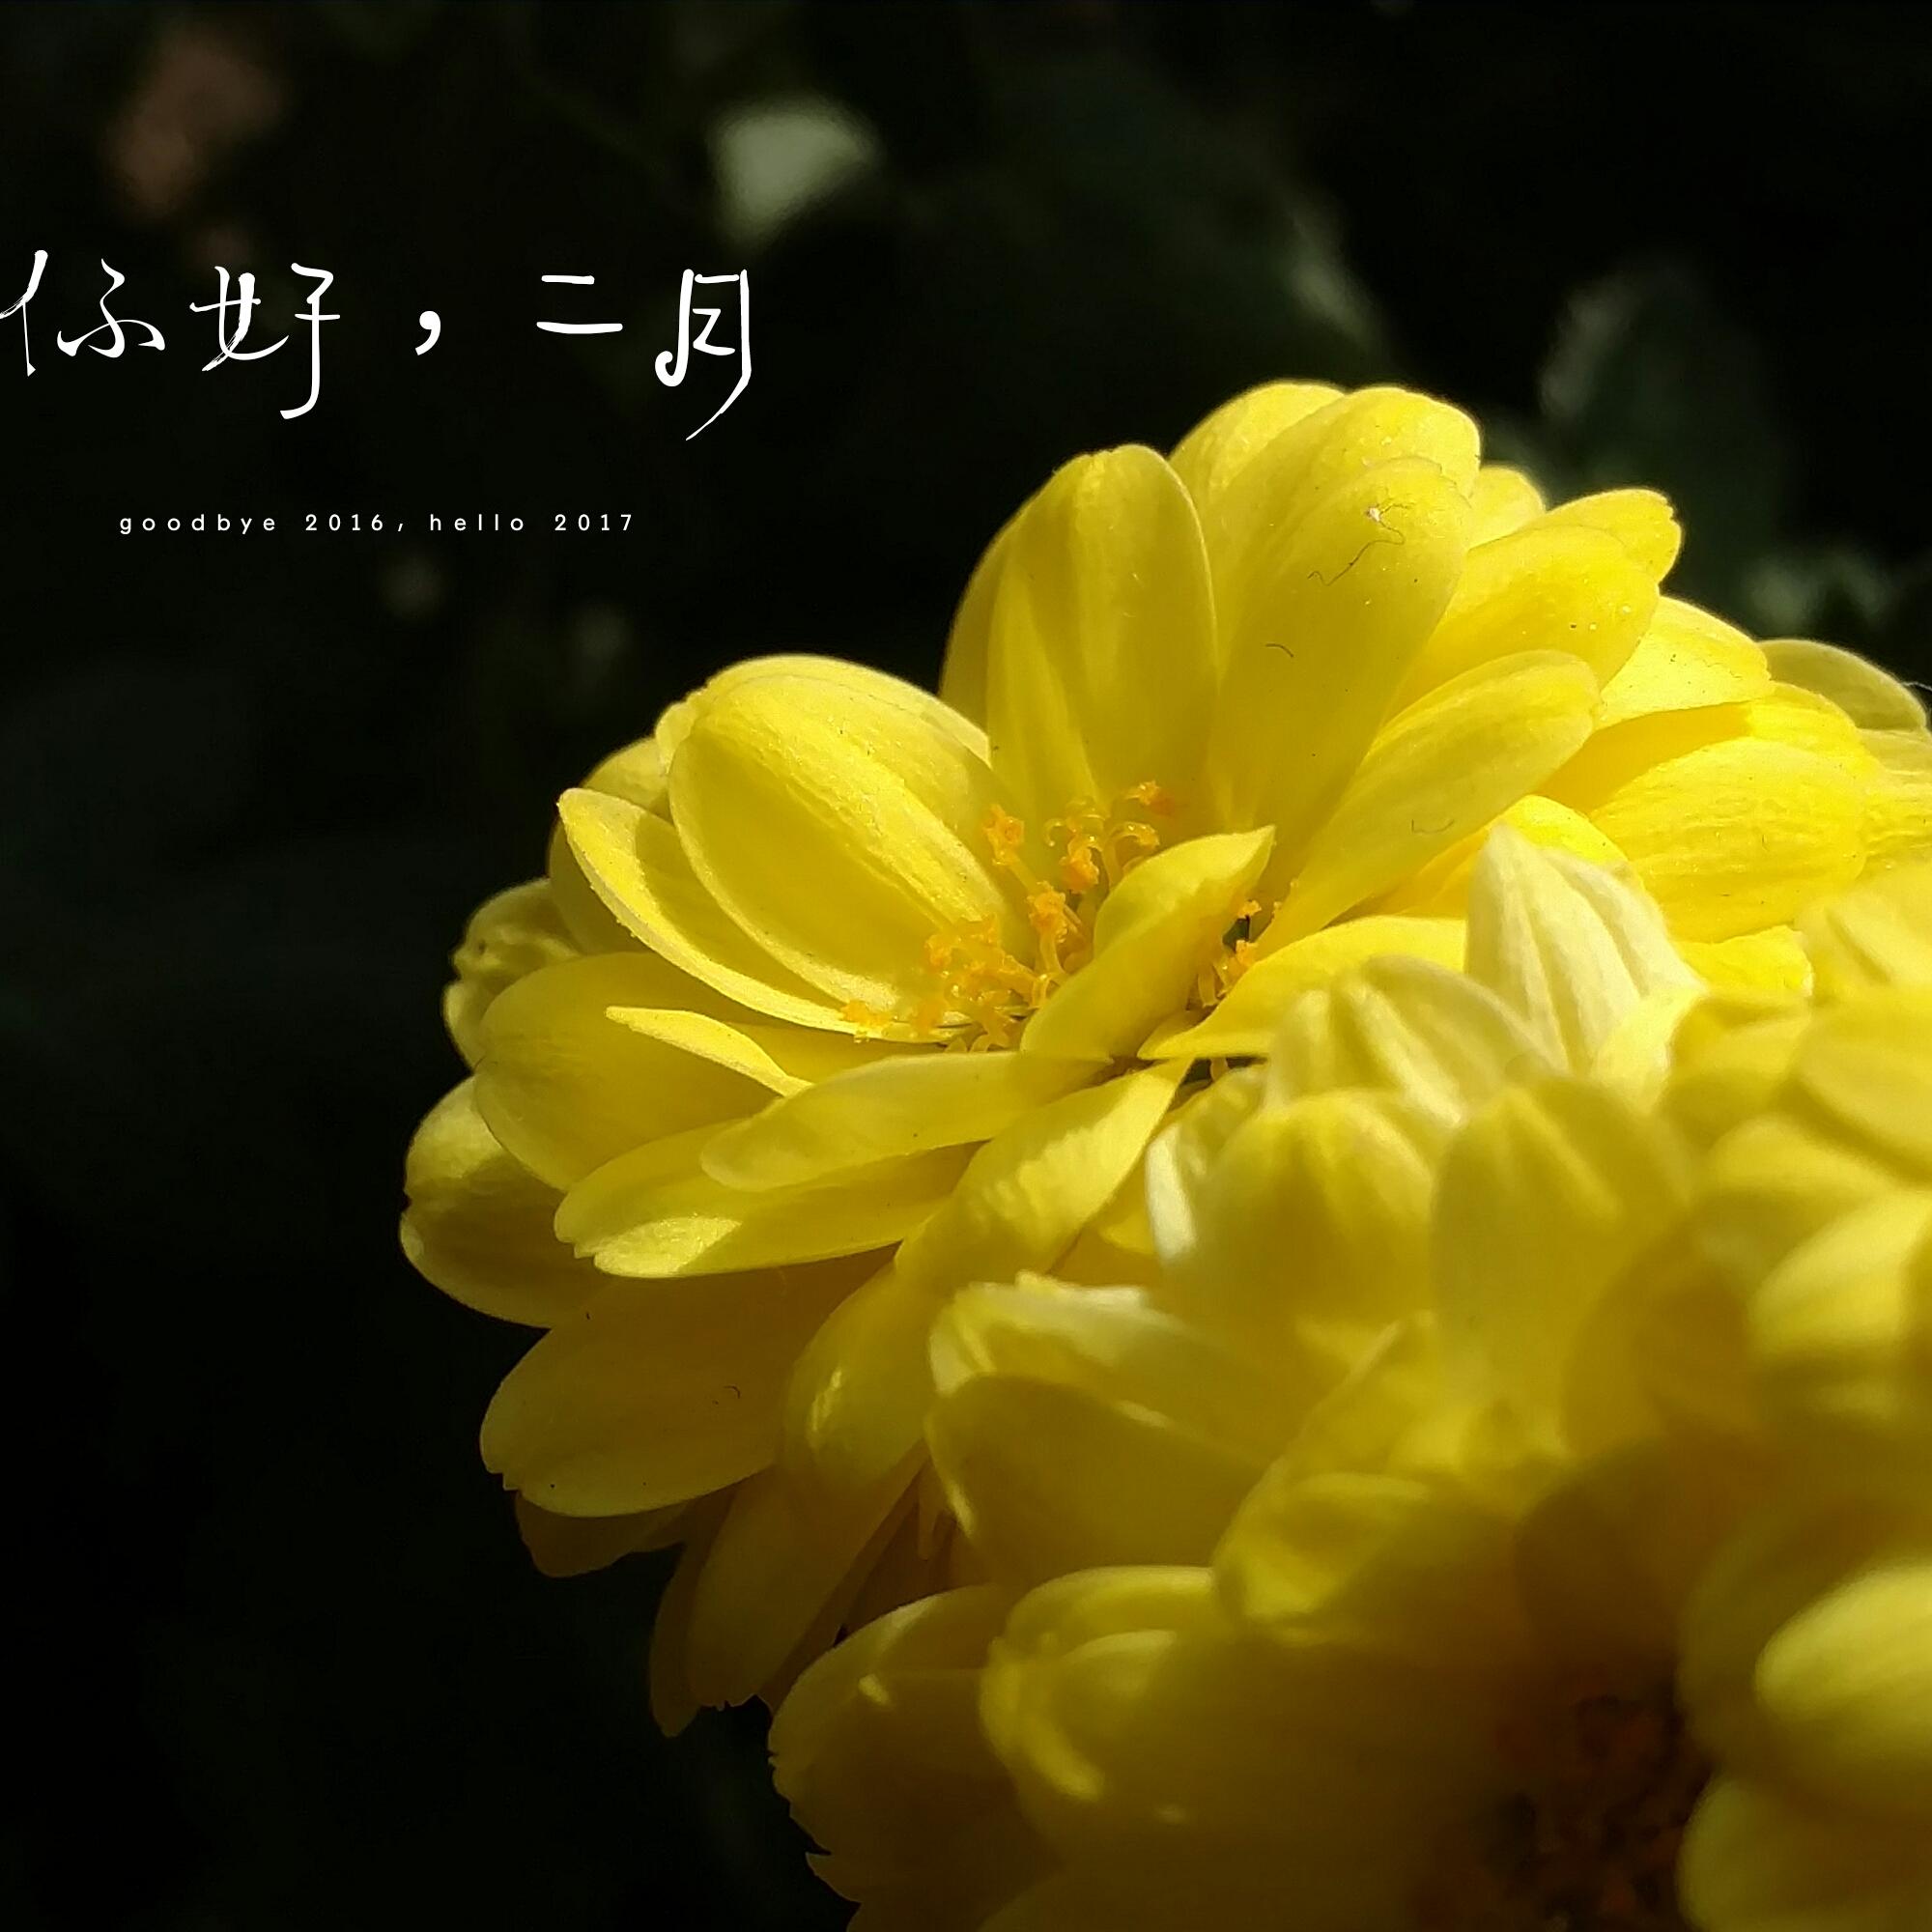 IMG_20170206_194853.jpg